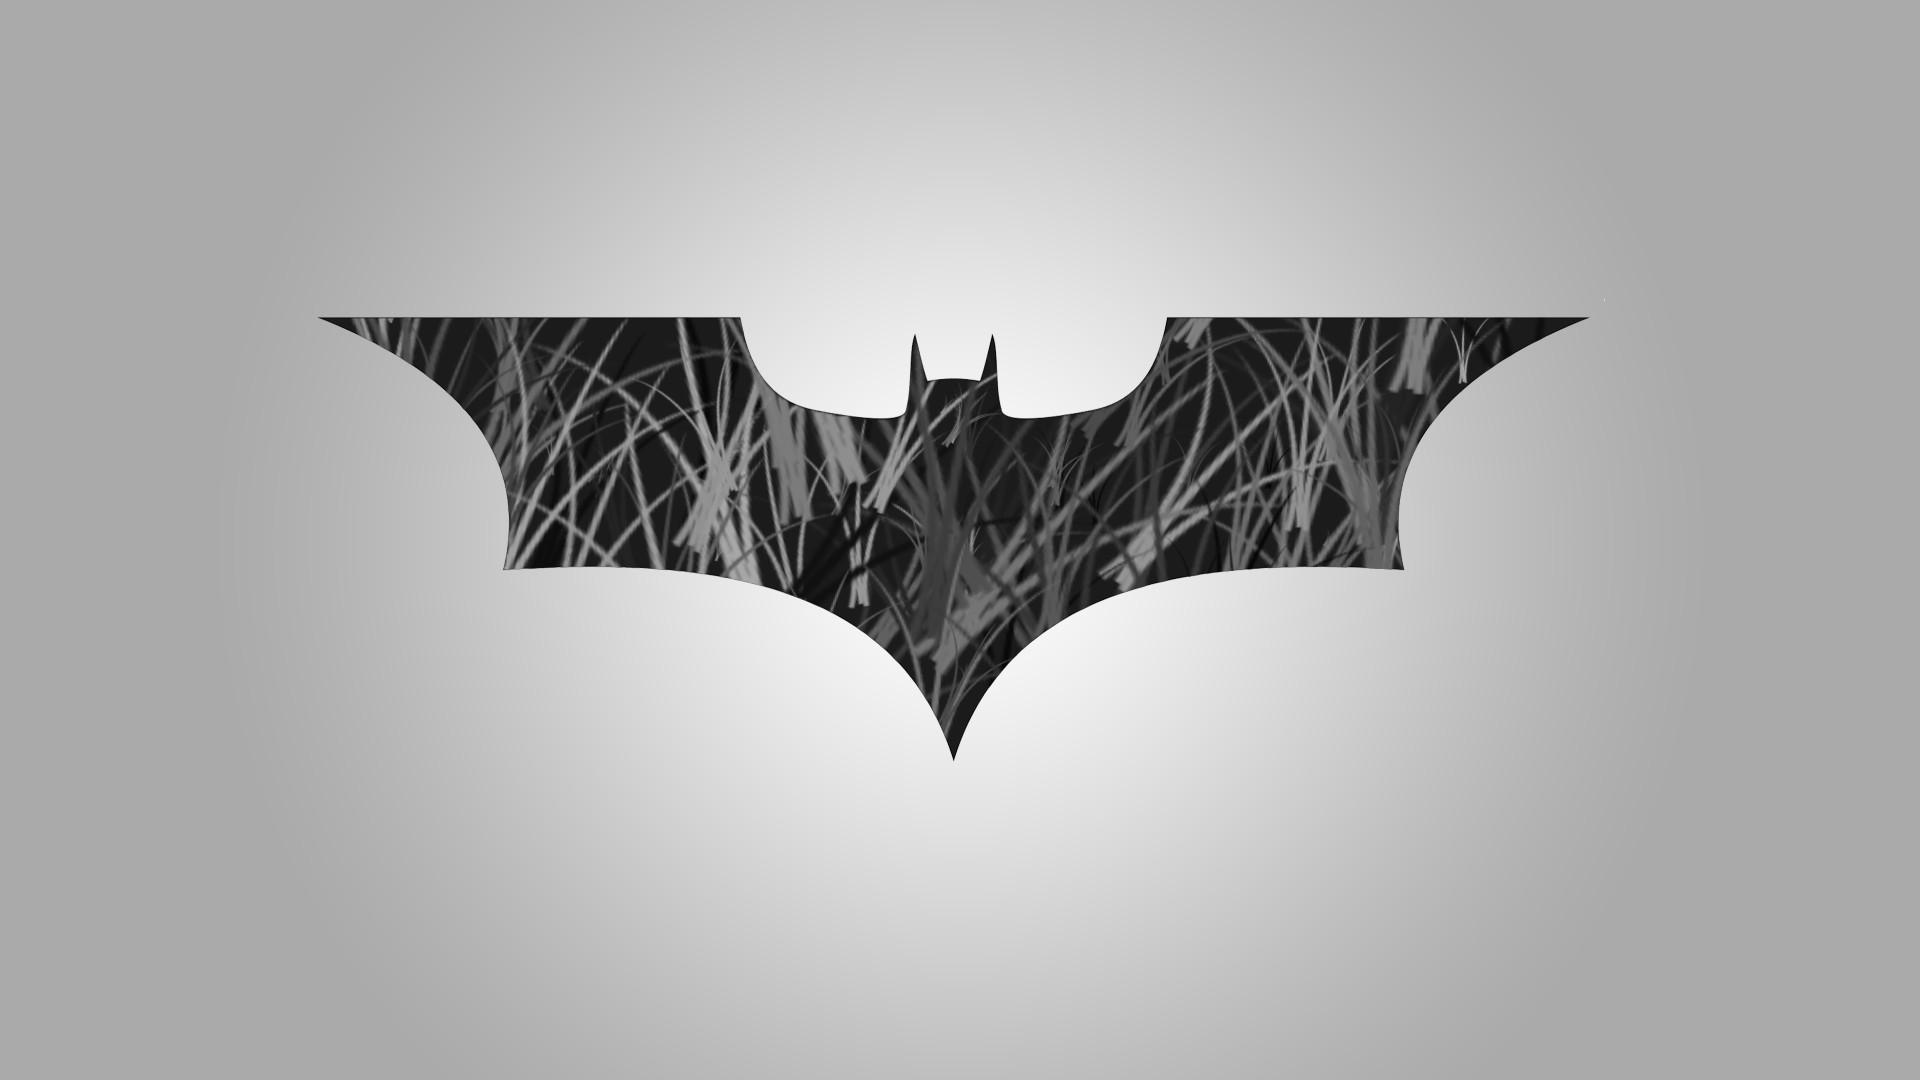 General 1920x1080 Batman logo minimalism monochrome